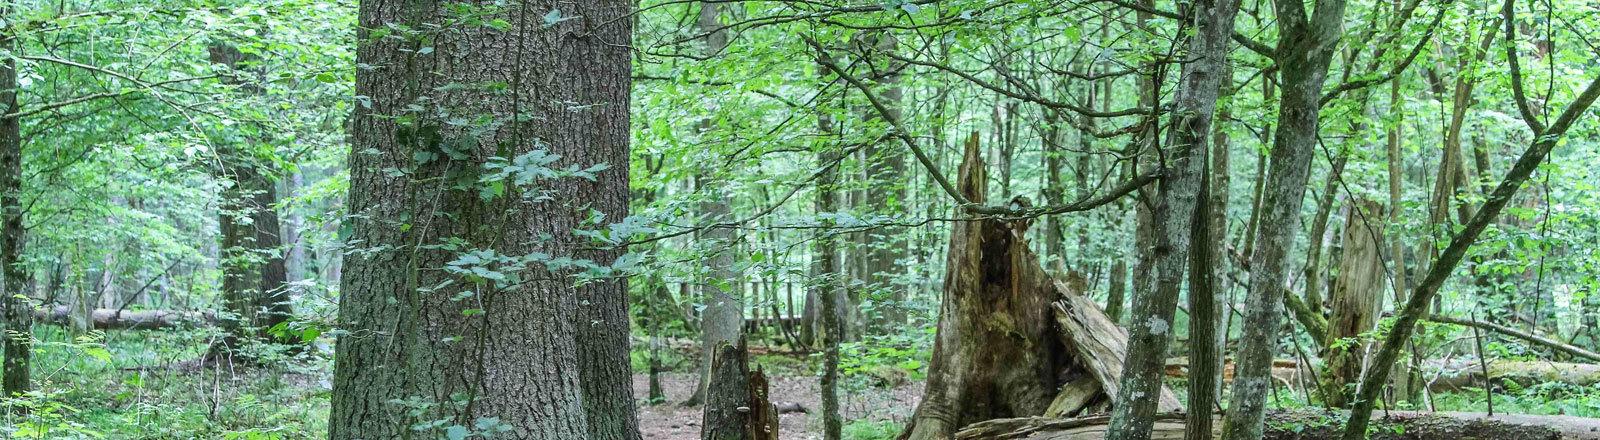 Bäume im Białowieża-Urwald in Polen